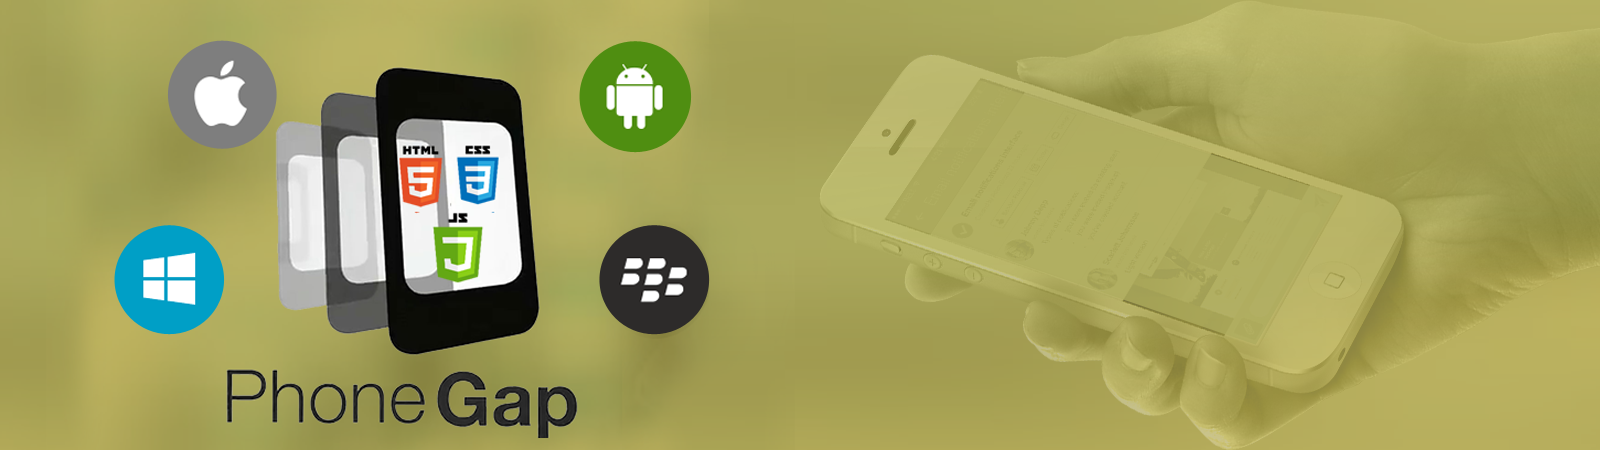 Phonegap App Development Services USA, UK, Canada